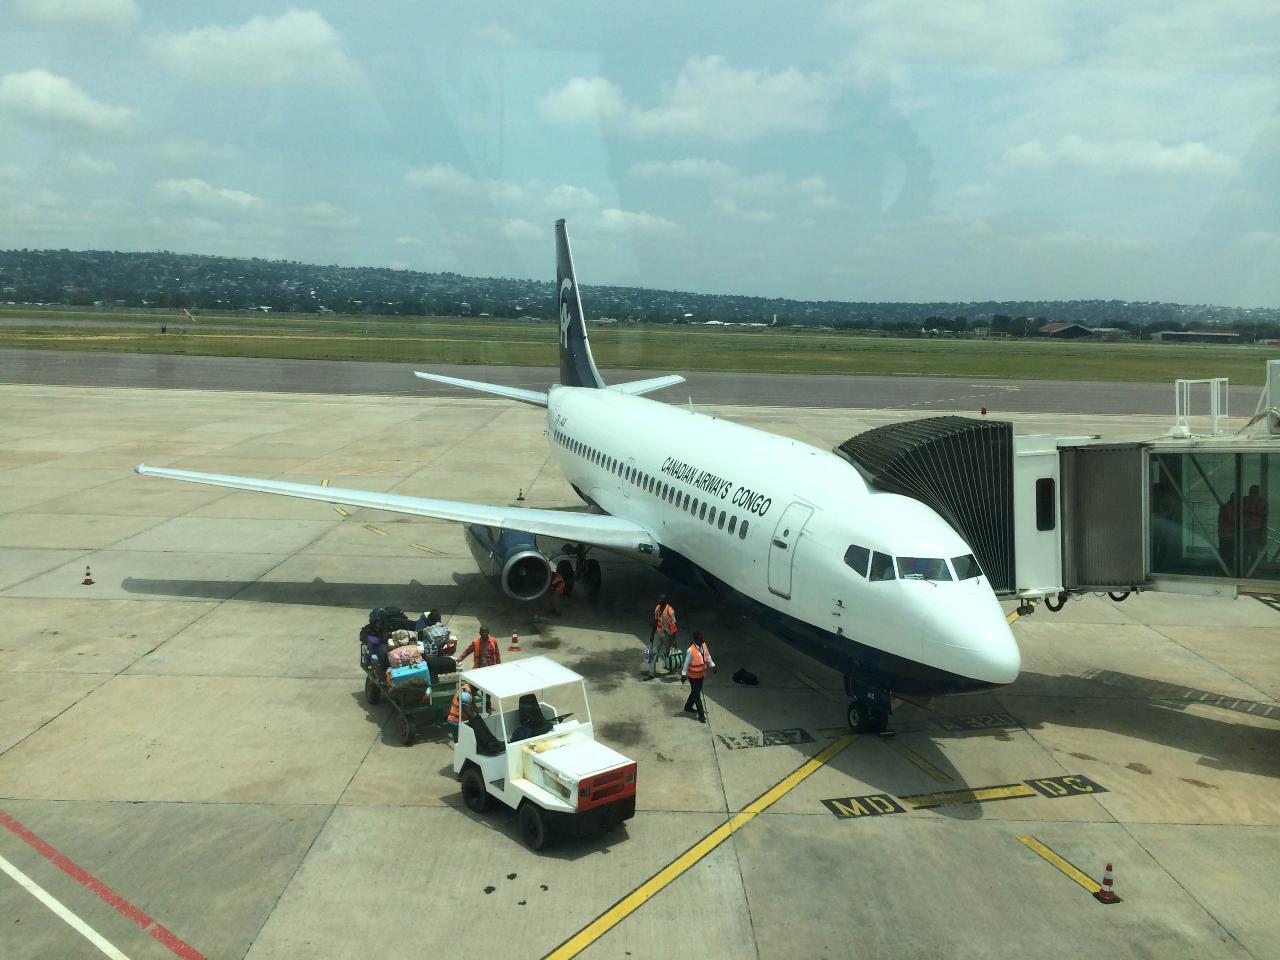 Domestic Flights Booking - Congo-Brazzaville (Republic of Congo) - Internal Flight Tickets Congo: Ouesso and Impfundo